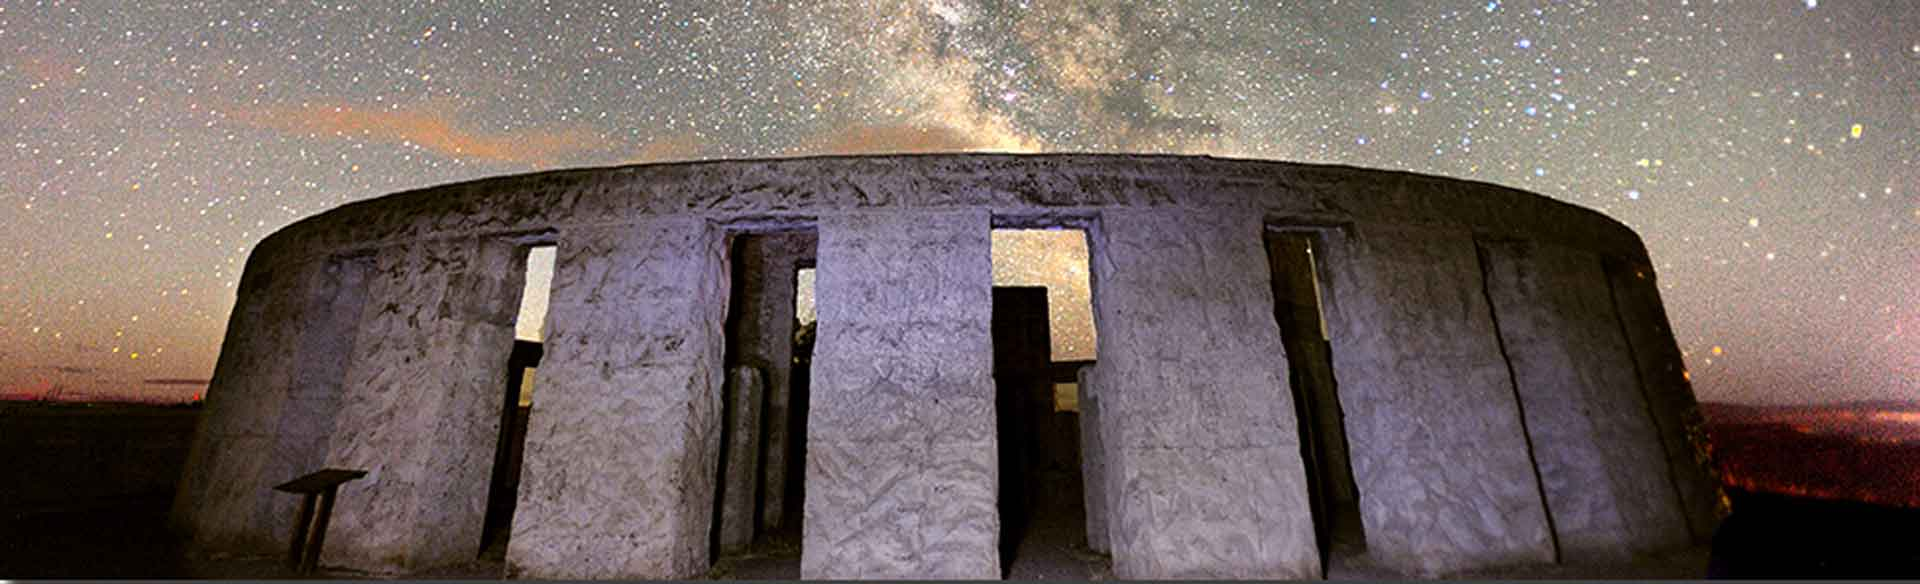 Stonehenge by Flickr user Bala Sivakumar